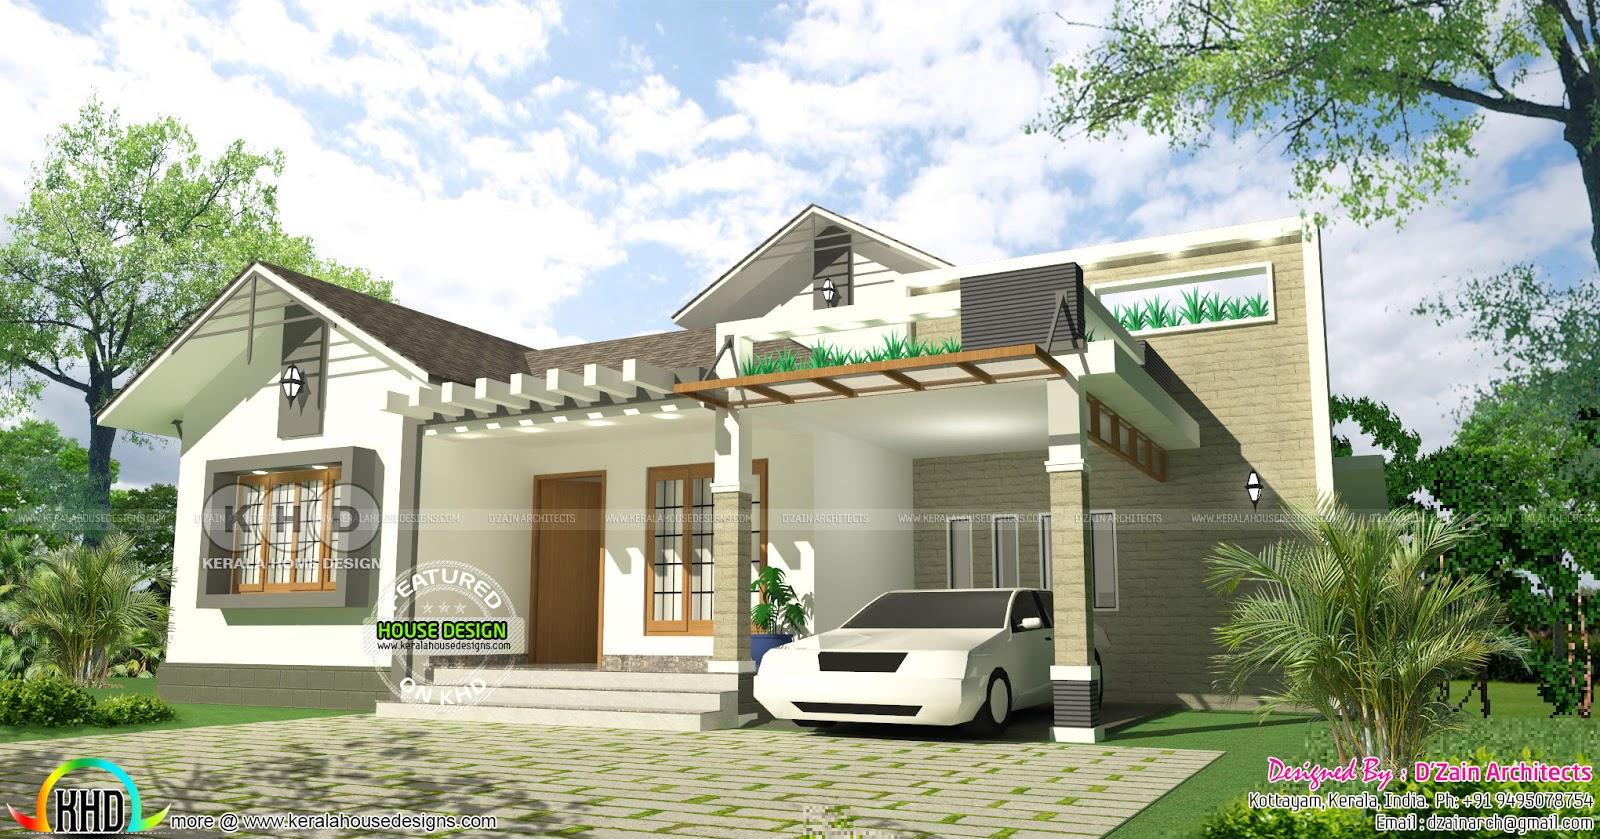 1850 square feet Mezzanine floor home - Kerala home design